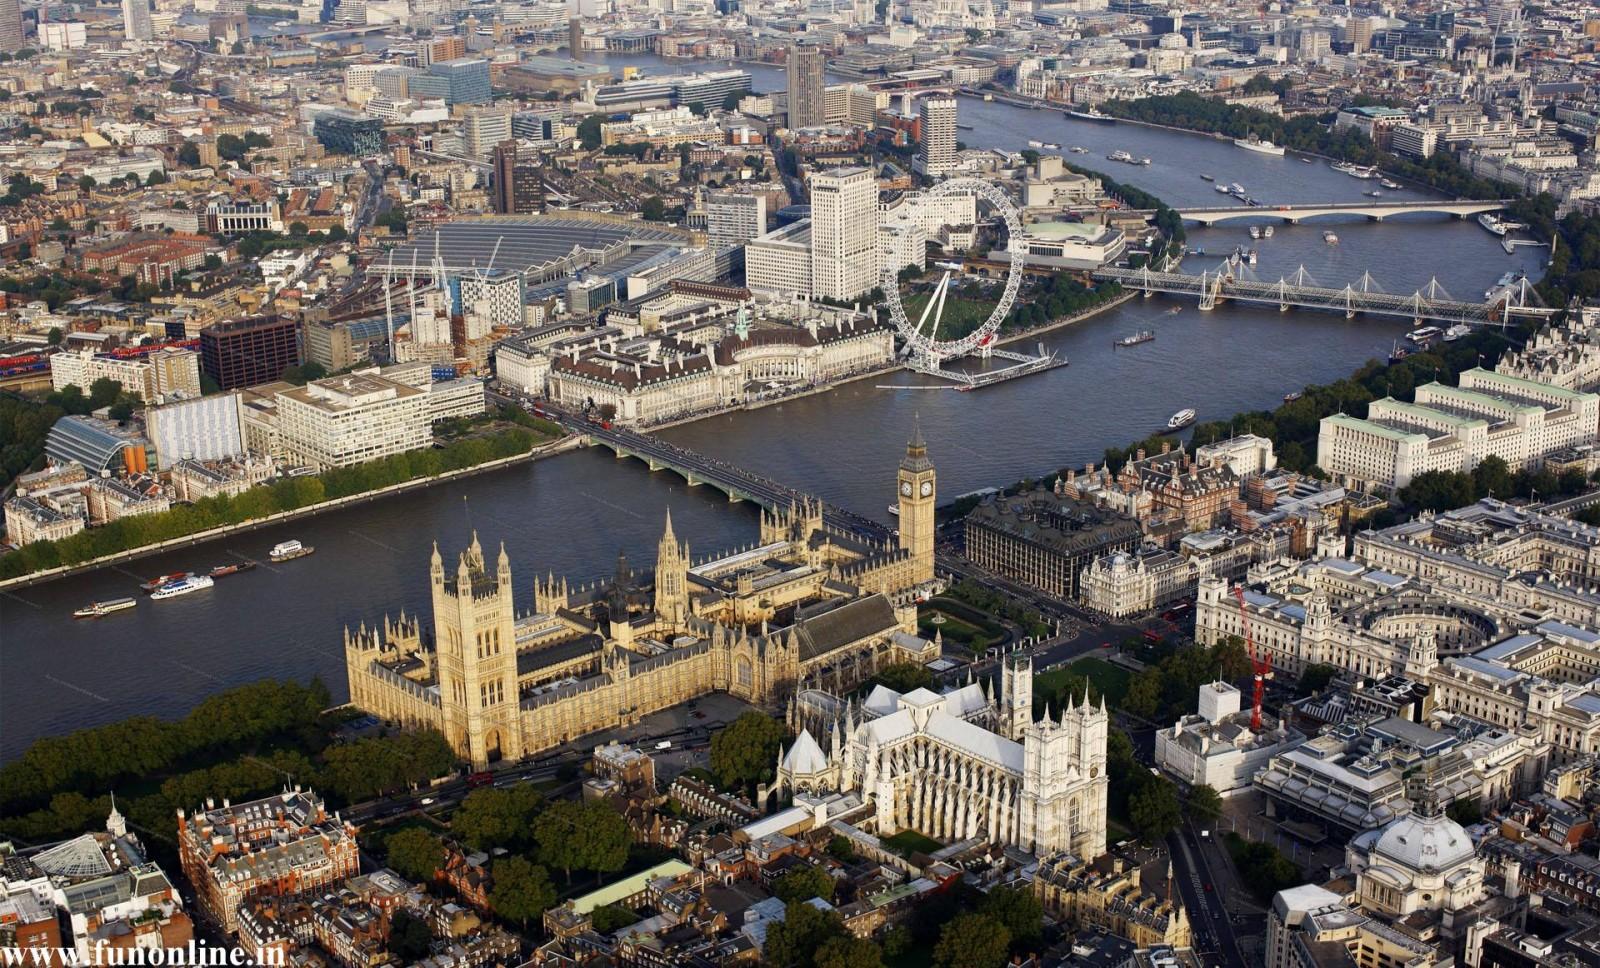 Fantastic Wallpaper Macbook London - 5  You Should Have_204835.jpg